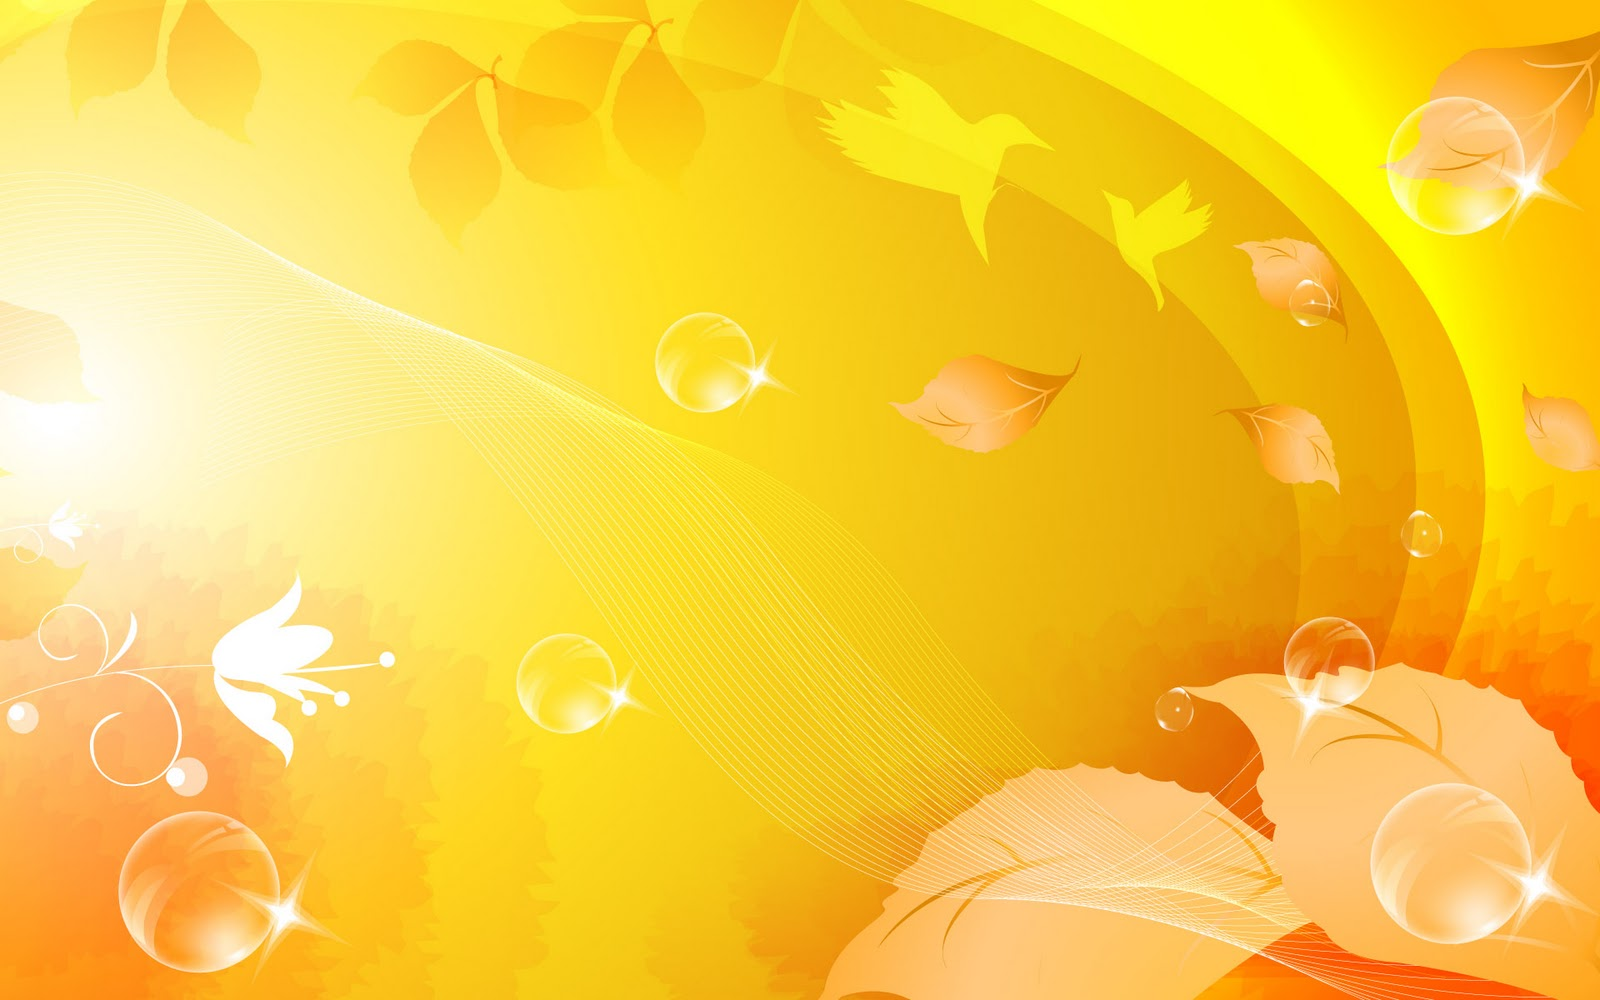 http://2.bp.blogspot.com/_lQH-_GBUXTc/TRuAvrip7DI/AAAAAAAAA_E/LExJrs_OzHE/s1600/Yellow%20Dry%203D%20Leaves%20%282010%29.jpg